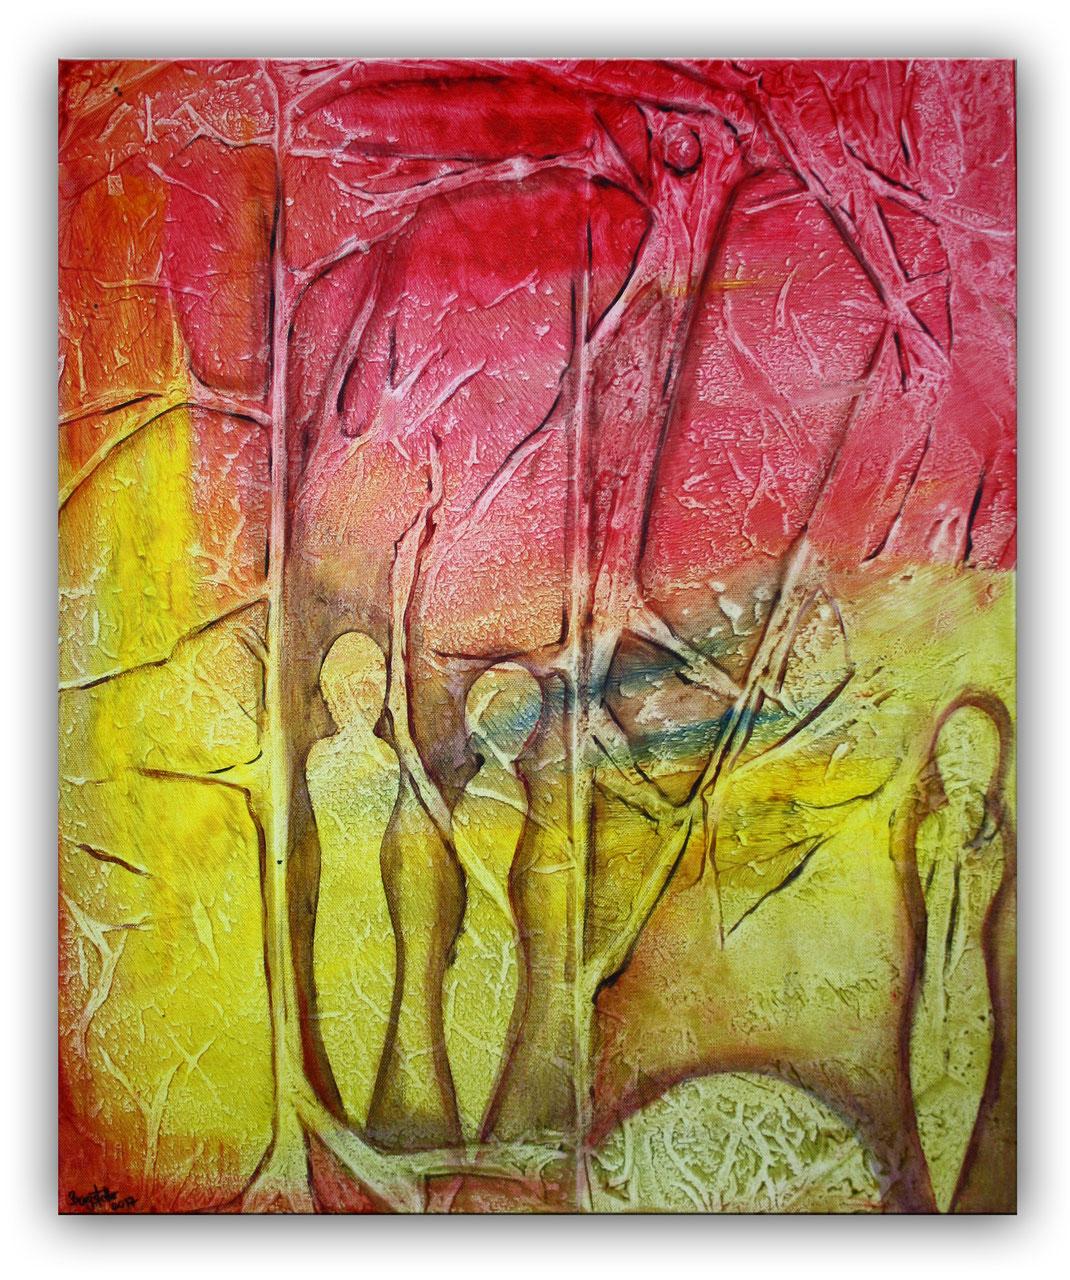 Figuren Wald Abstraktes Gemalde Rot Gelb Burgstaller